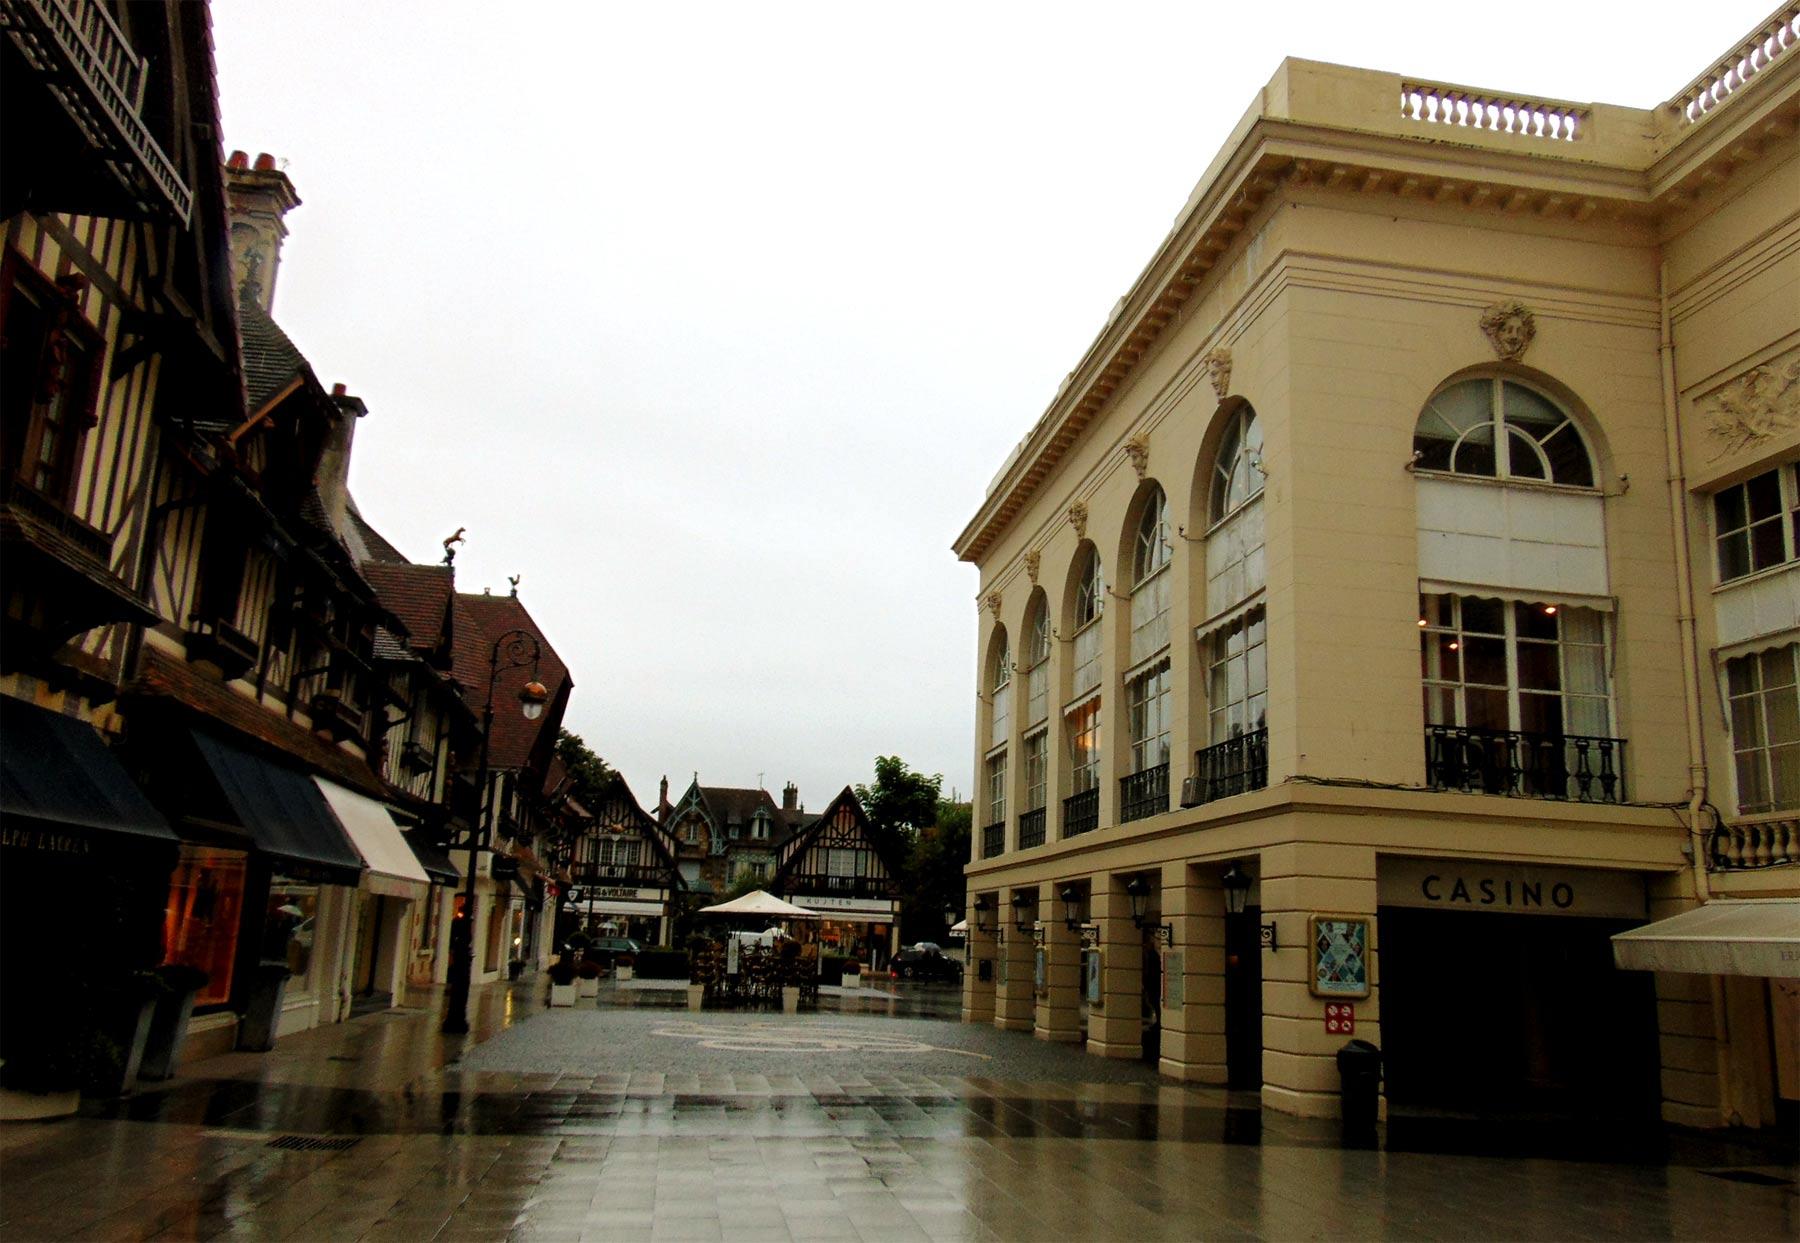 экскурсия из Парижа в казино Довиля Нормандия